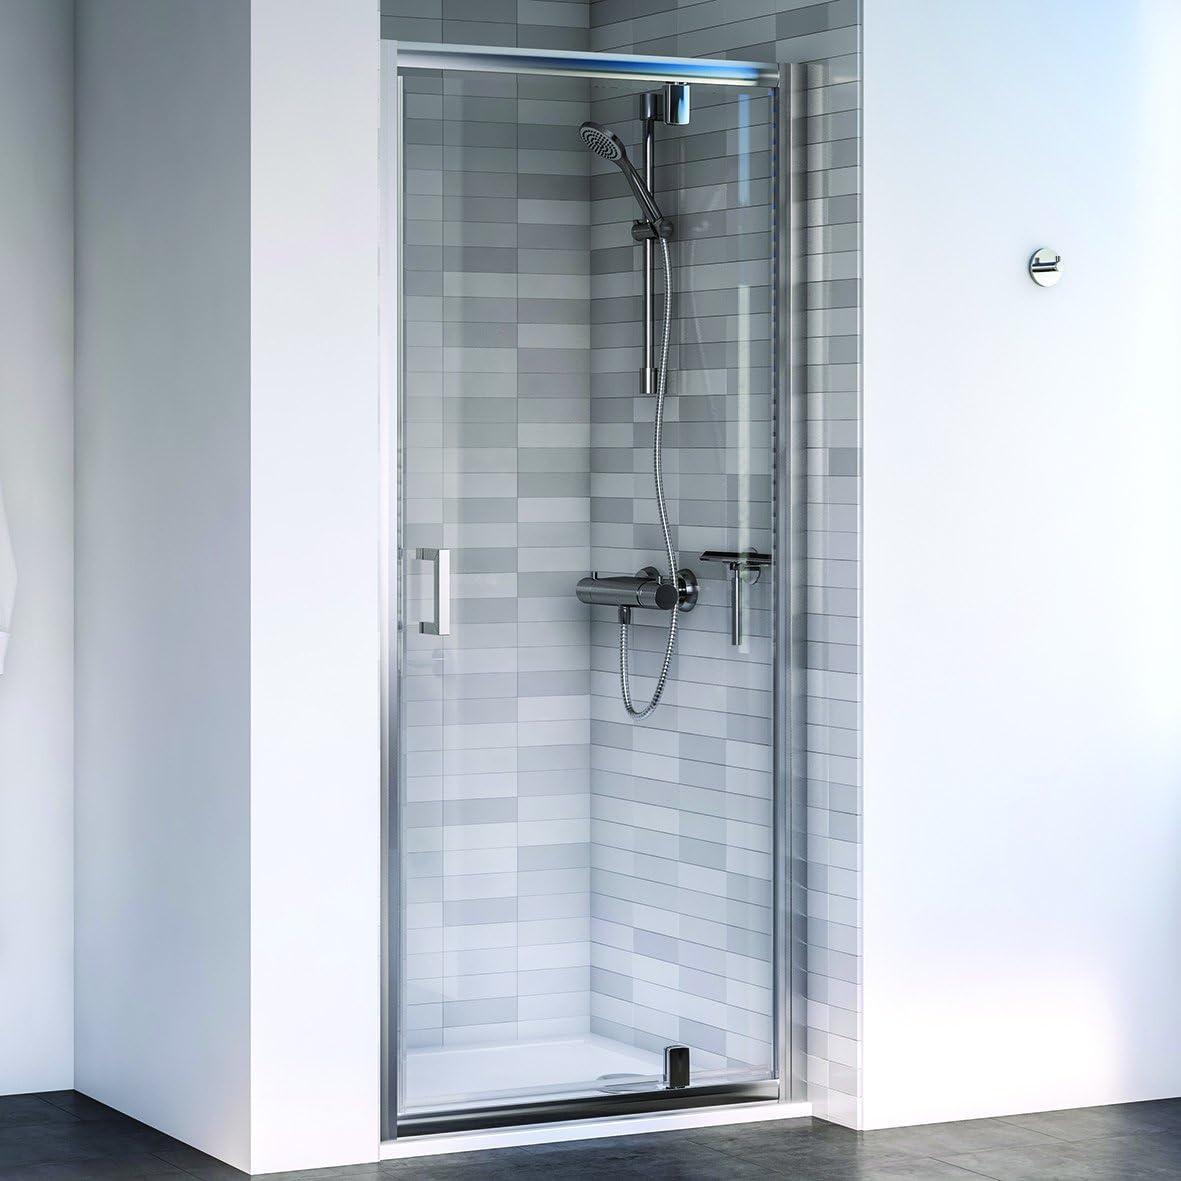 Aqualux 1193800 Pivot para mampara de ducha receso ajuste, pulido ...